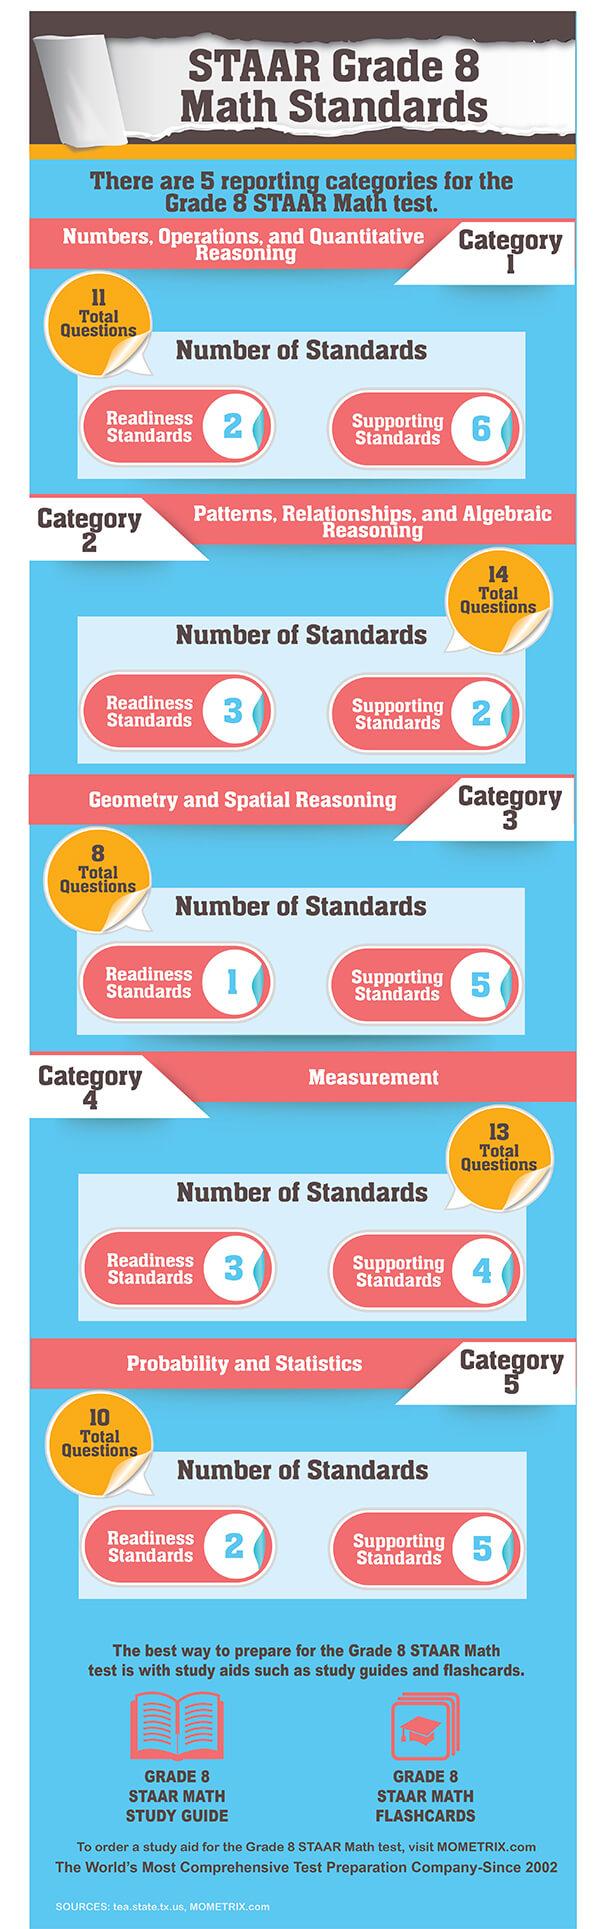 medium resolution of STAAR Mathematics Grade 8 Practice Test (Example Questions)